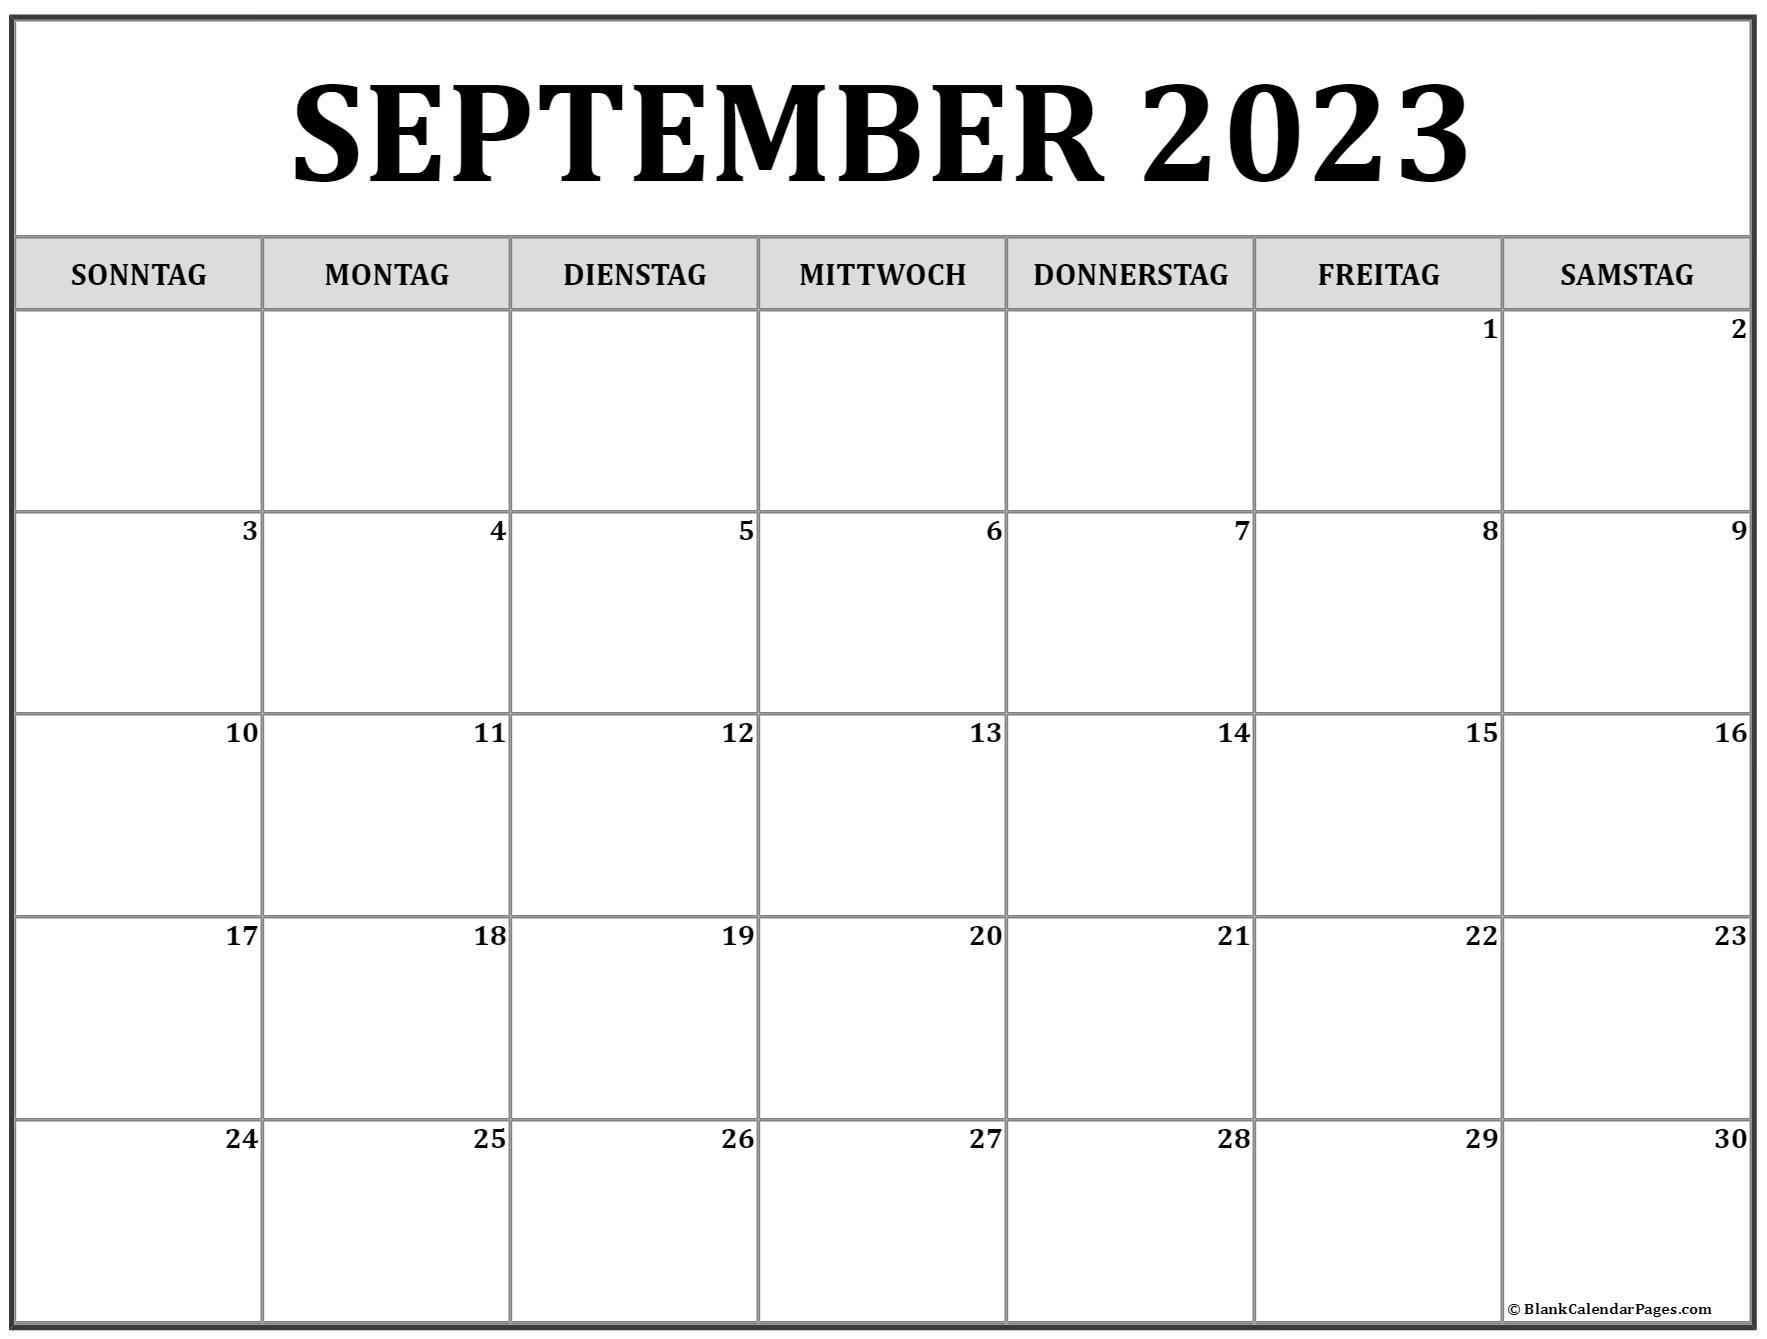 September 2022 kalender   kalender 2022